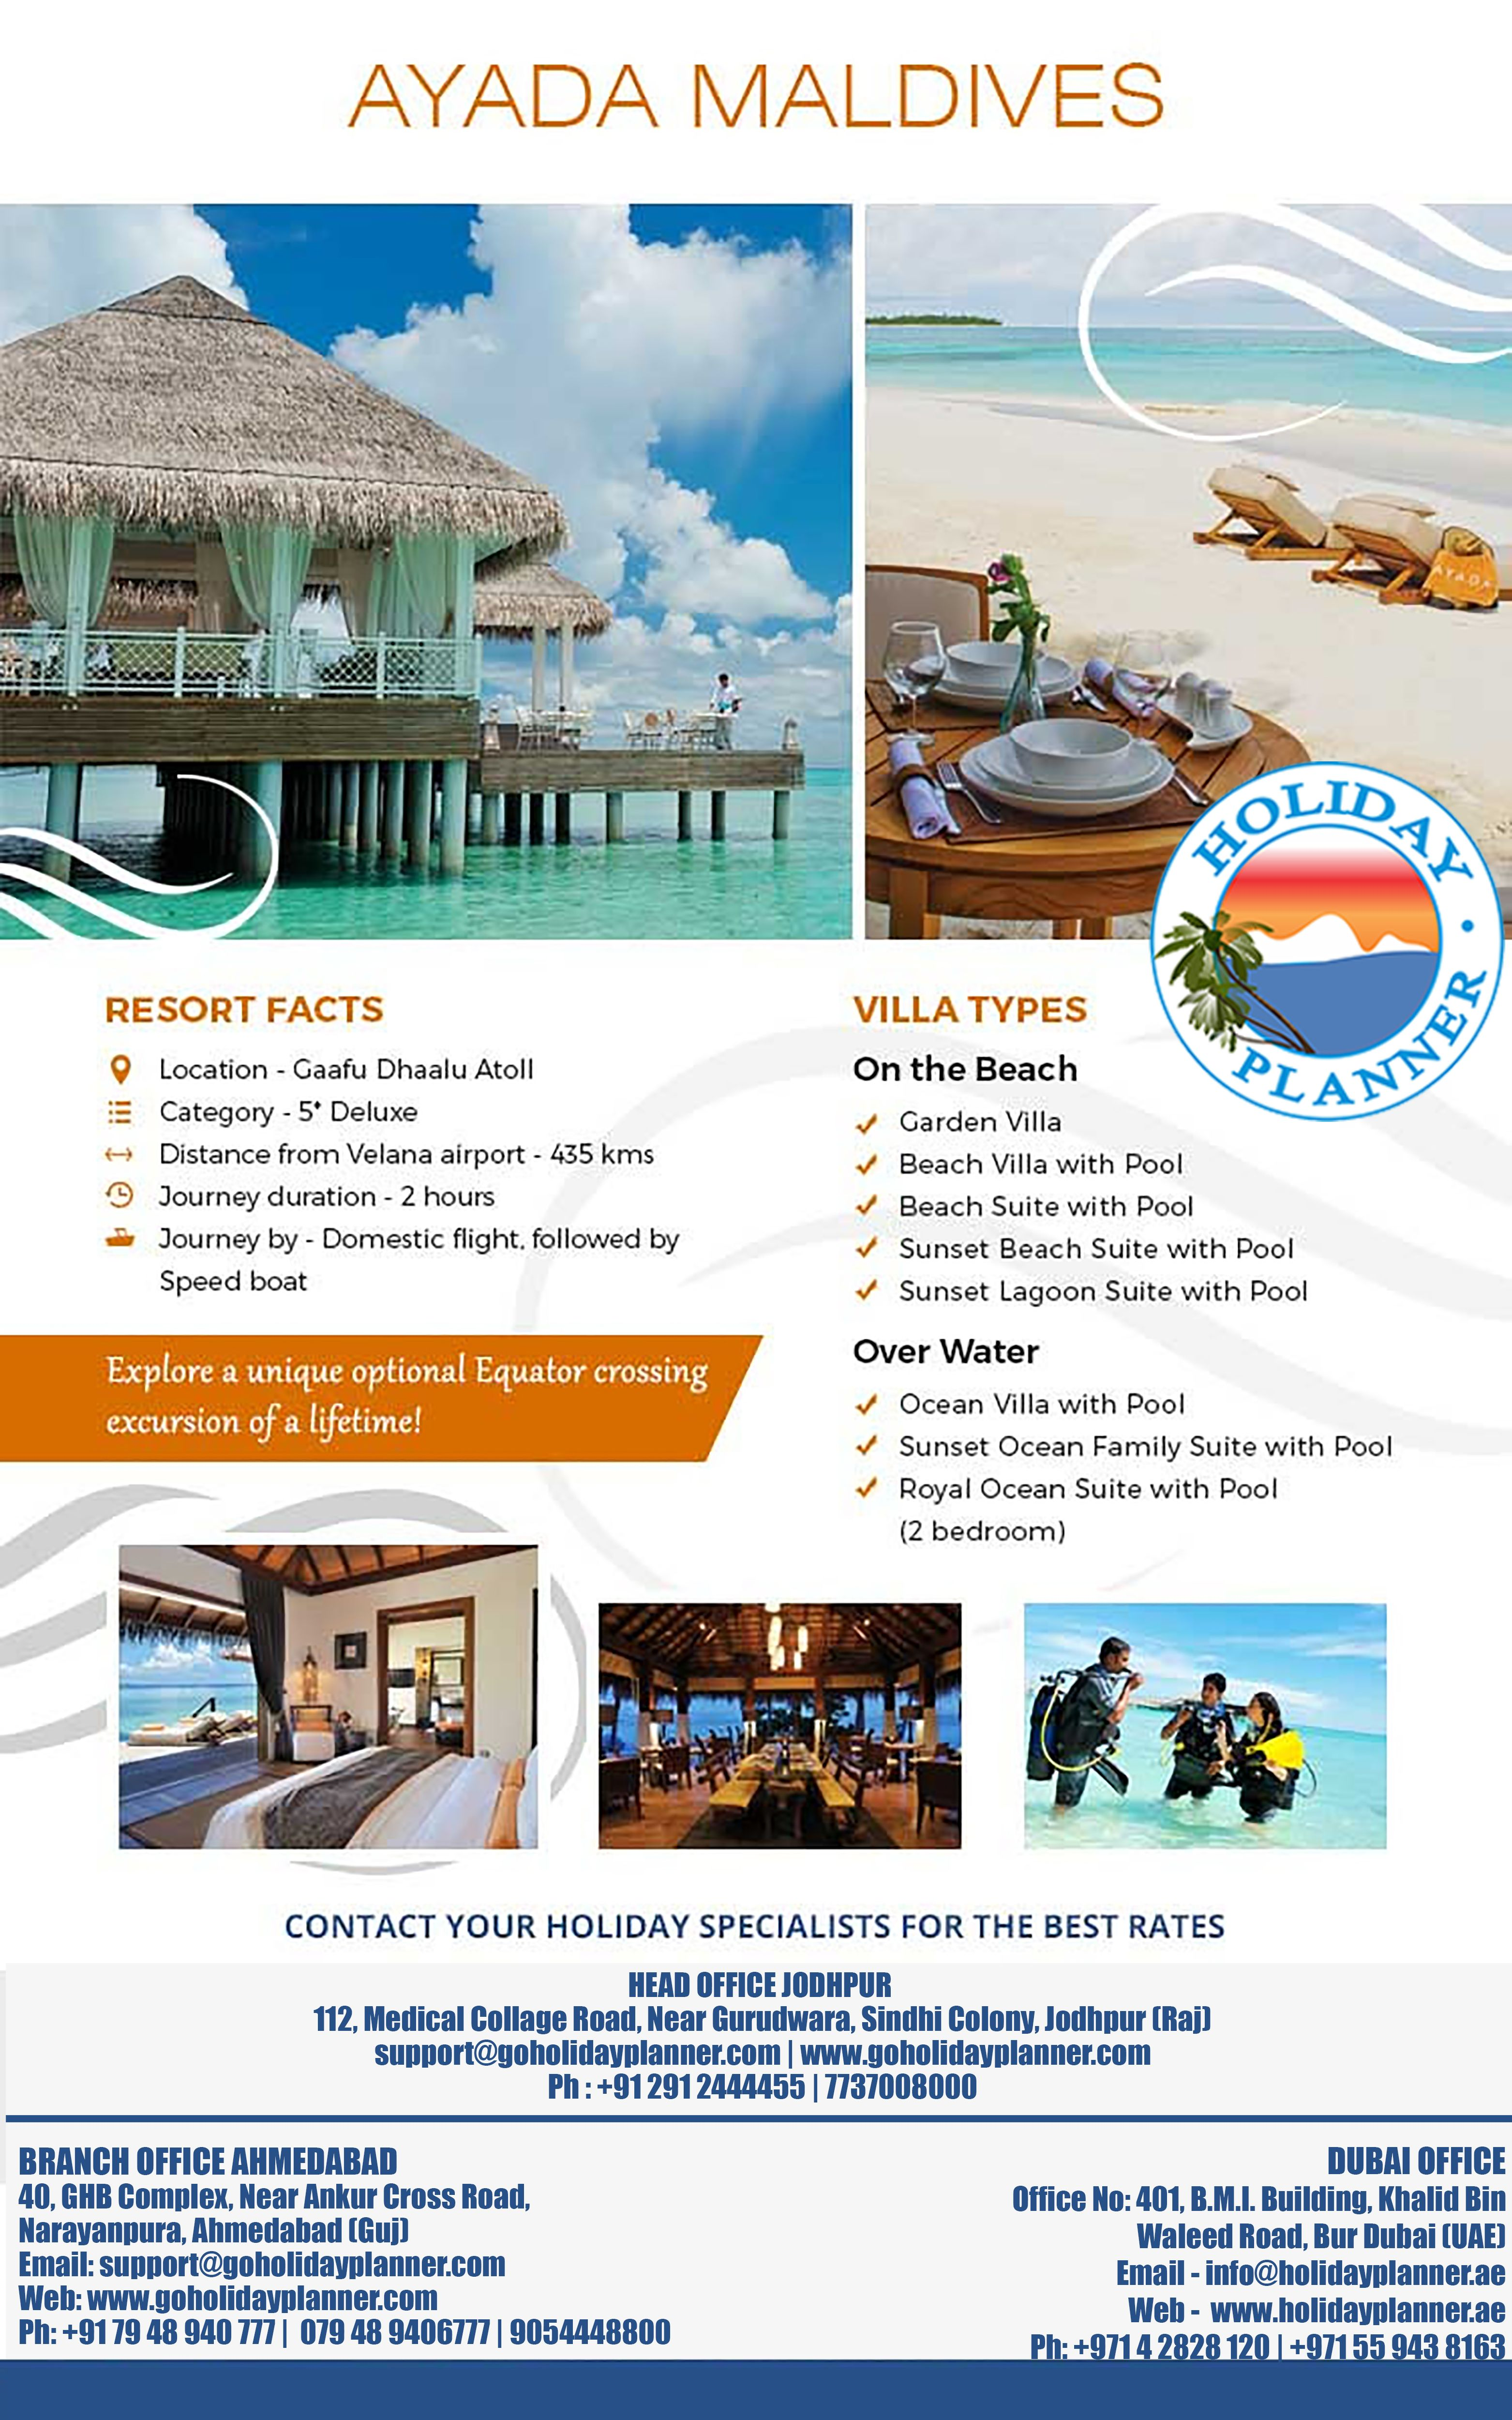 Ayada_Maldives Holiday Planner India JodhpurOffice